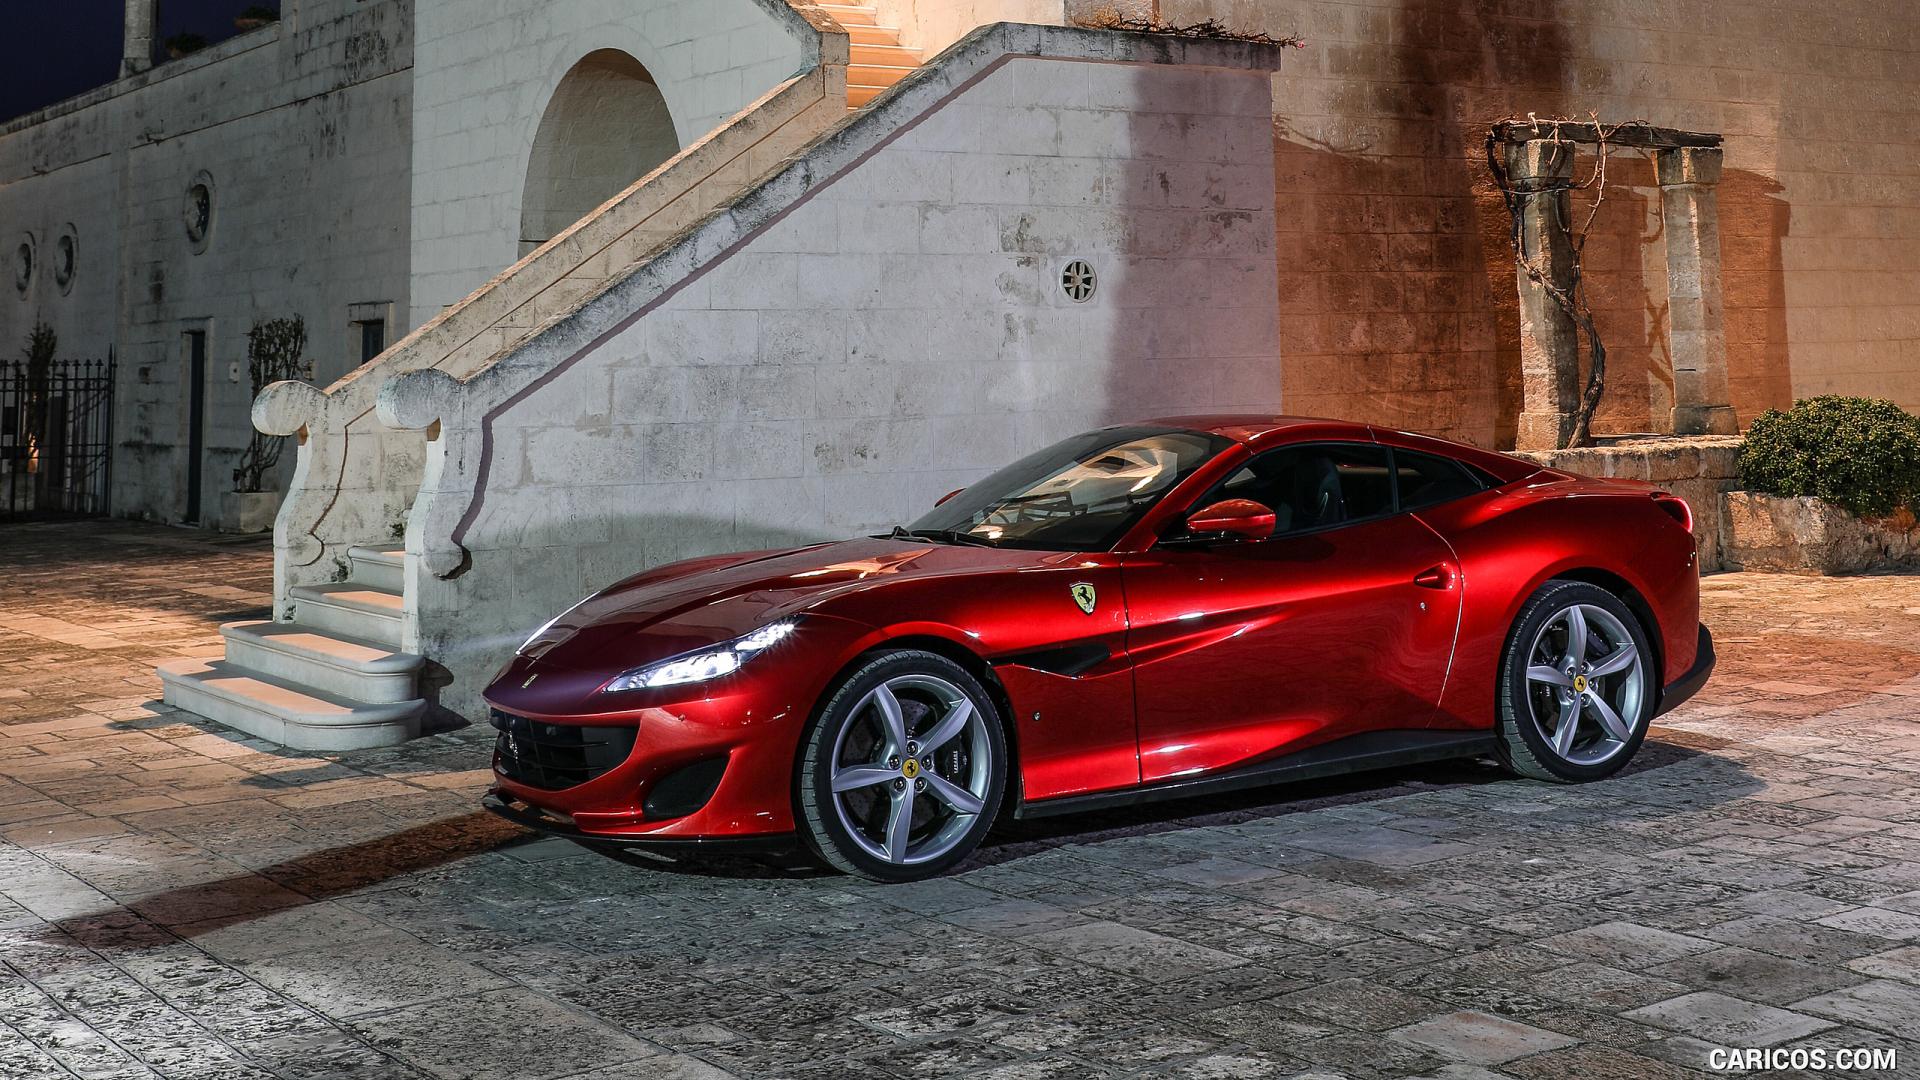 Ferrari Car Wallpaper Hd For Mobile